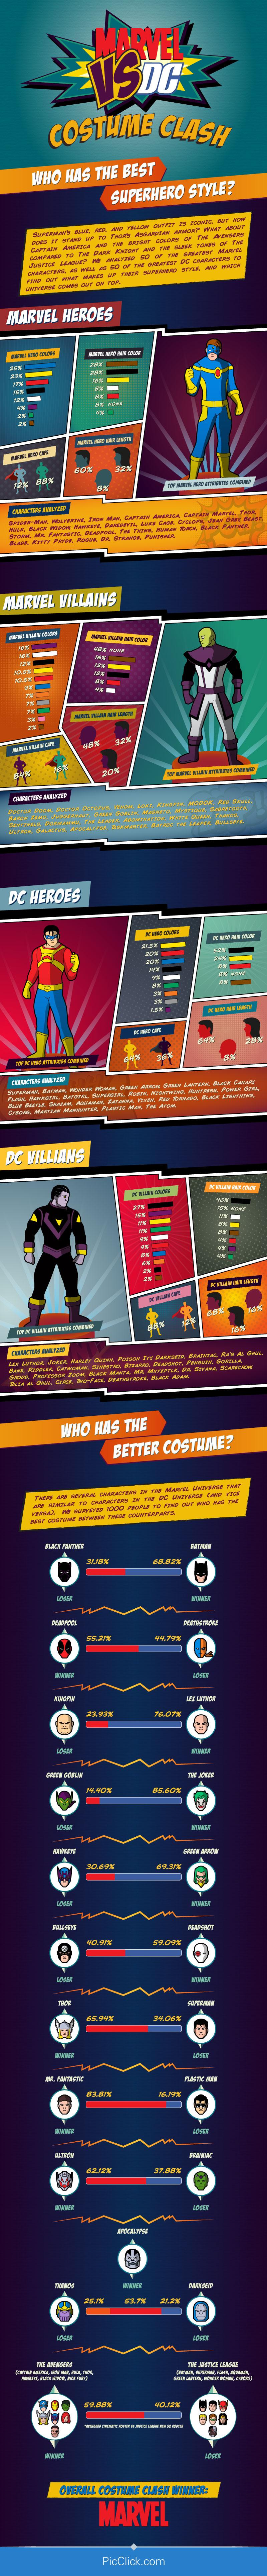 marvel-vs-dc-costume-clash-infographic1